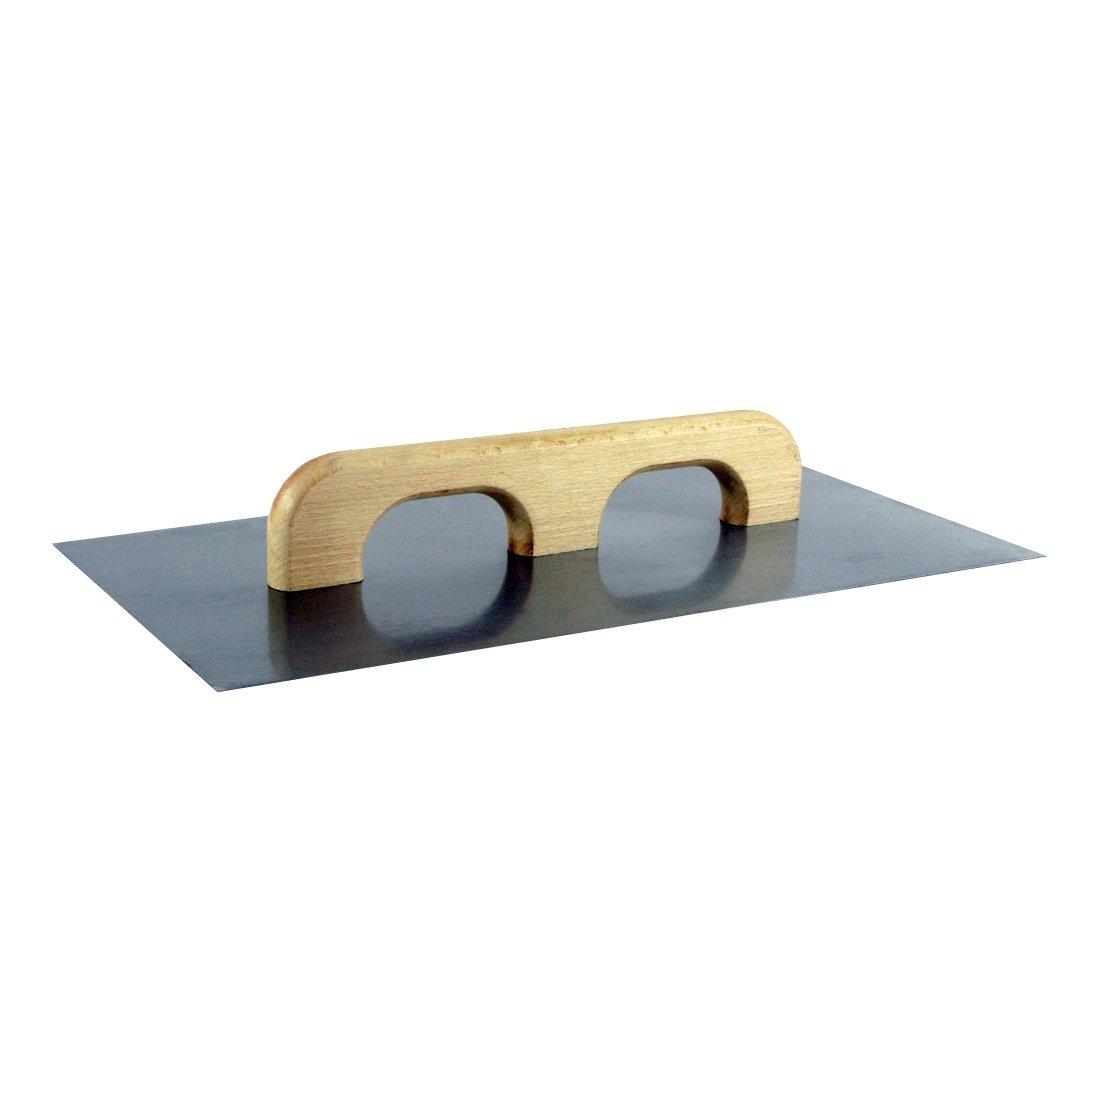 Stahl-Aufziehplatte 500 x 260 x 1,2 mm, blank, Doppel-Holzgriff bauCompany24